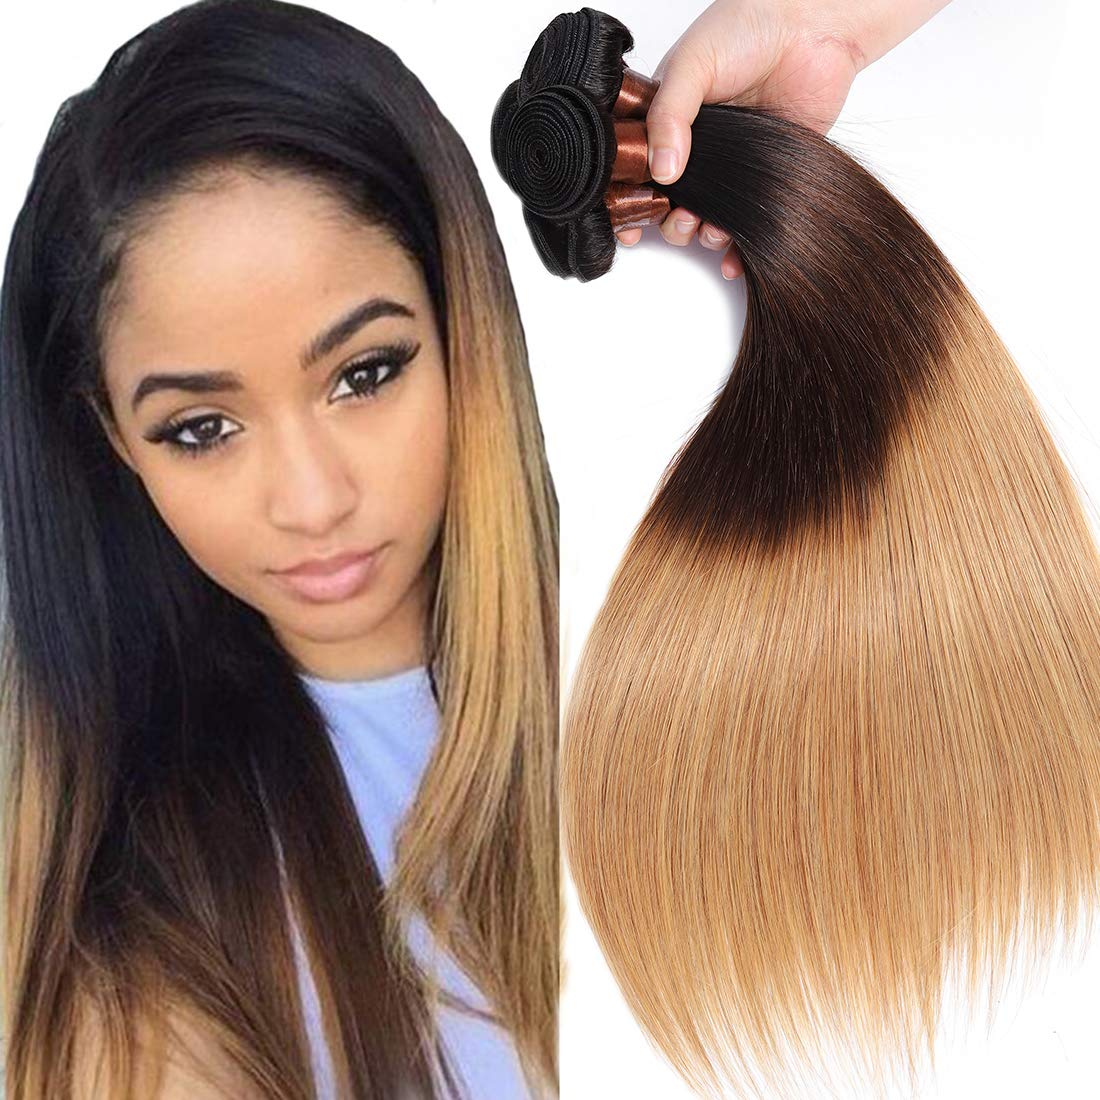 Amazon Com Cranberry Hair Ombre Brazilian Virgin Hair Straight Hair Weave Bundles Three Tone Color Human Hair Weaving Blonde Hair T1b 4 27 16 18 20 22 Beauty